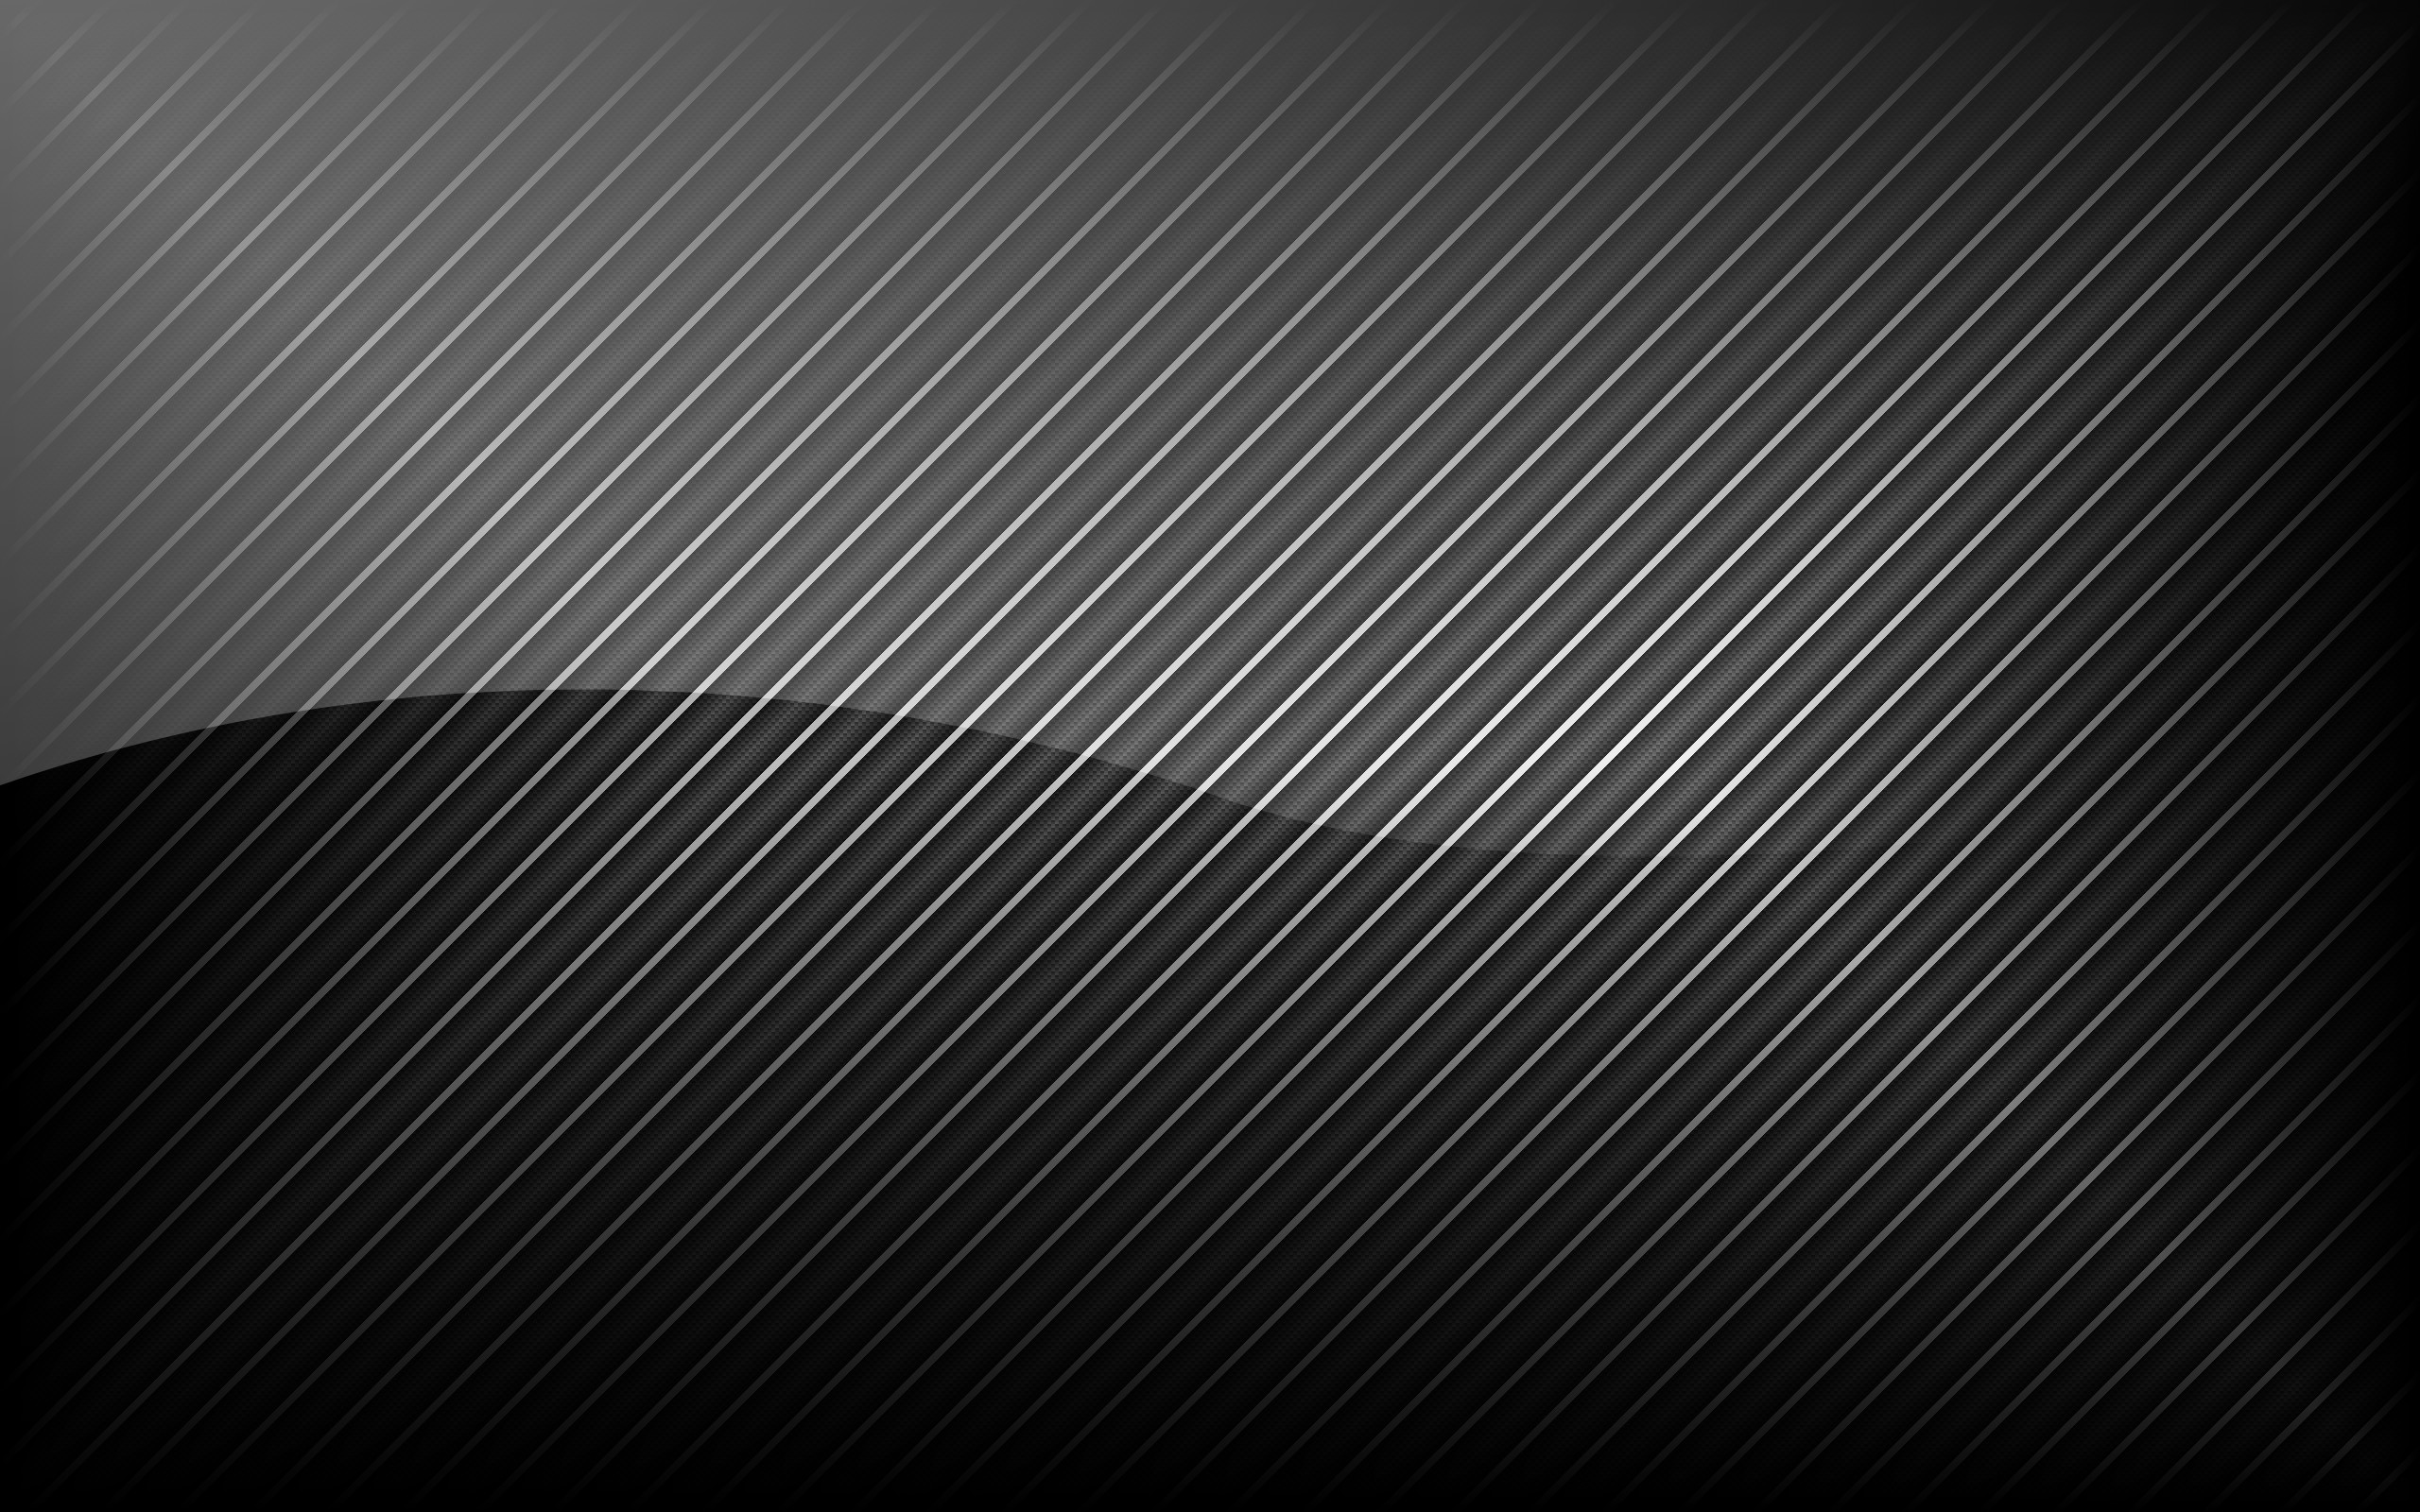 1920x1080 BMW E60 M5 RED Carbon fiber skinning exterior door pillars from  NVD Autosport - Carbon Fiber PNG